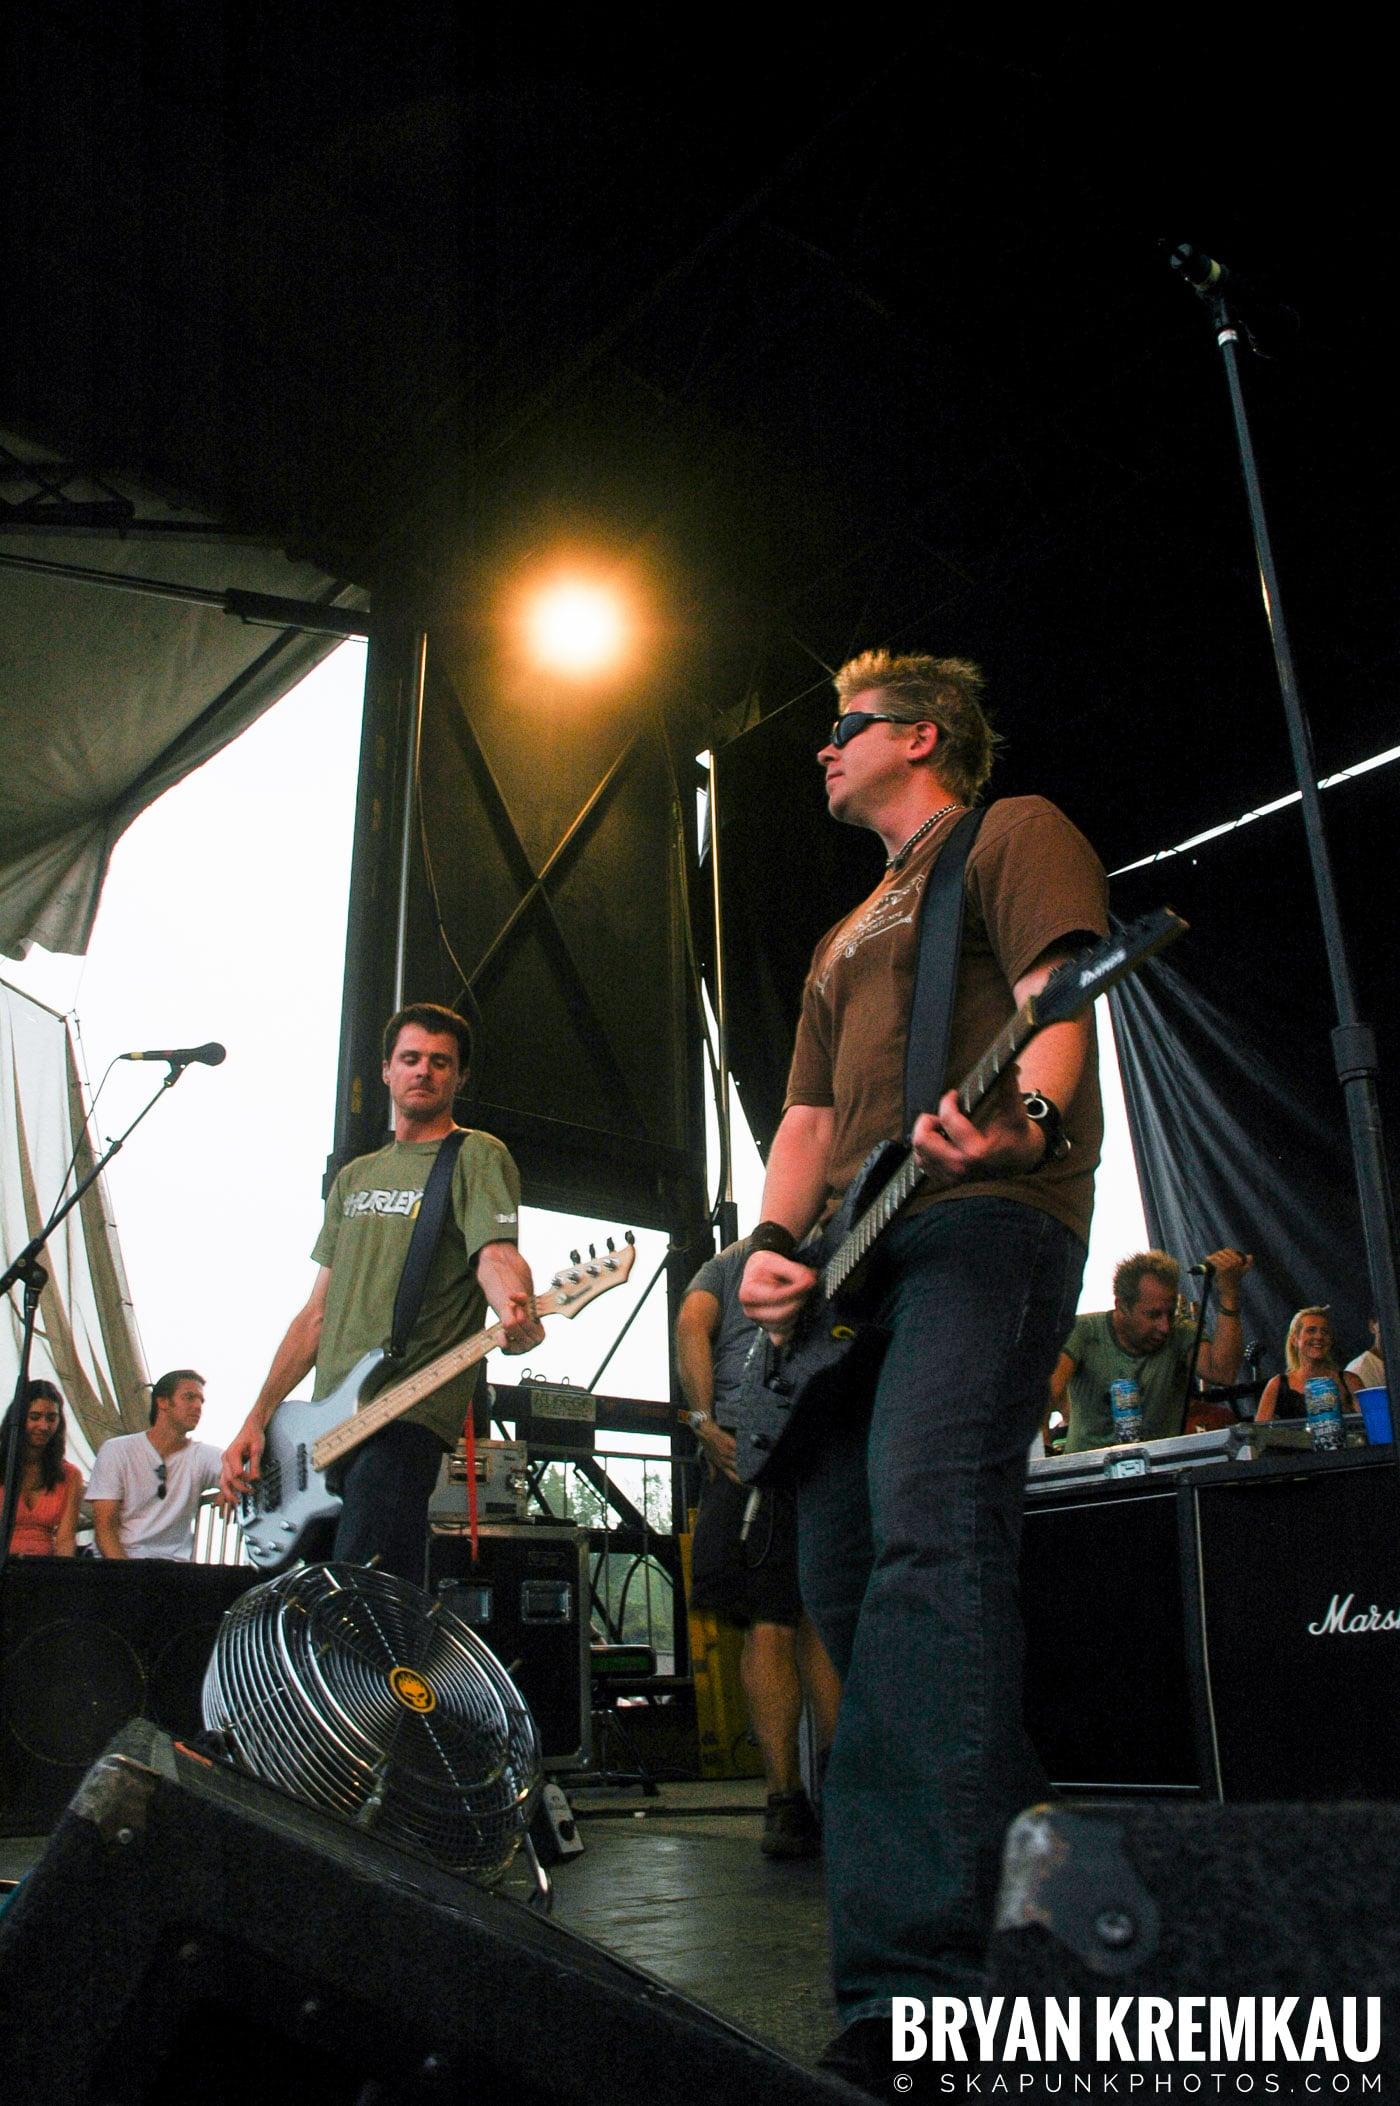 The Offspring @ Warped Tour 05, NYC - 8.12.05 (7)